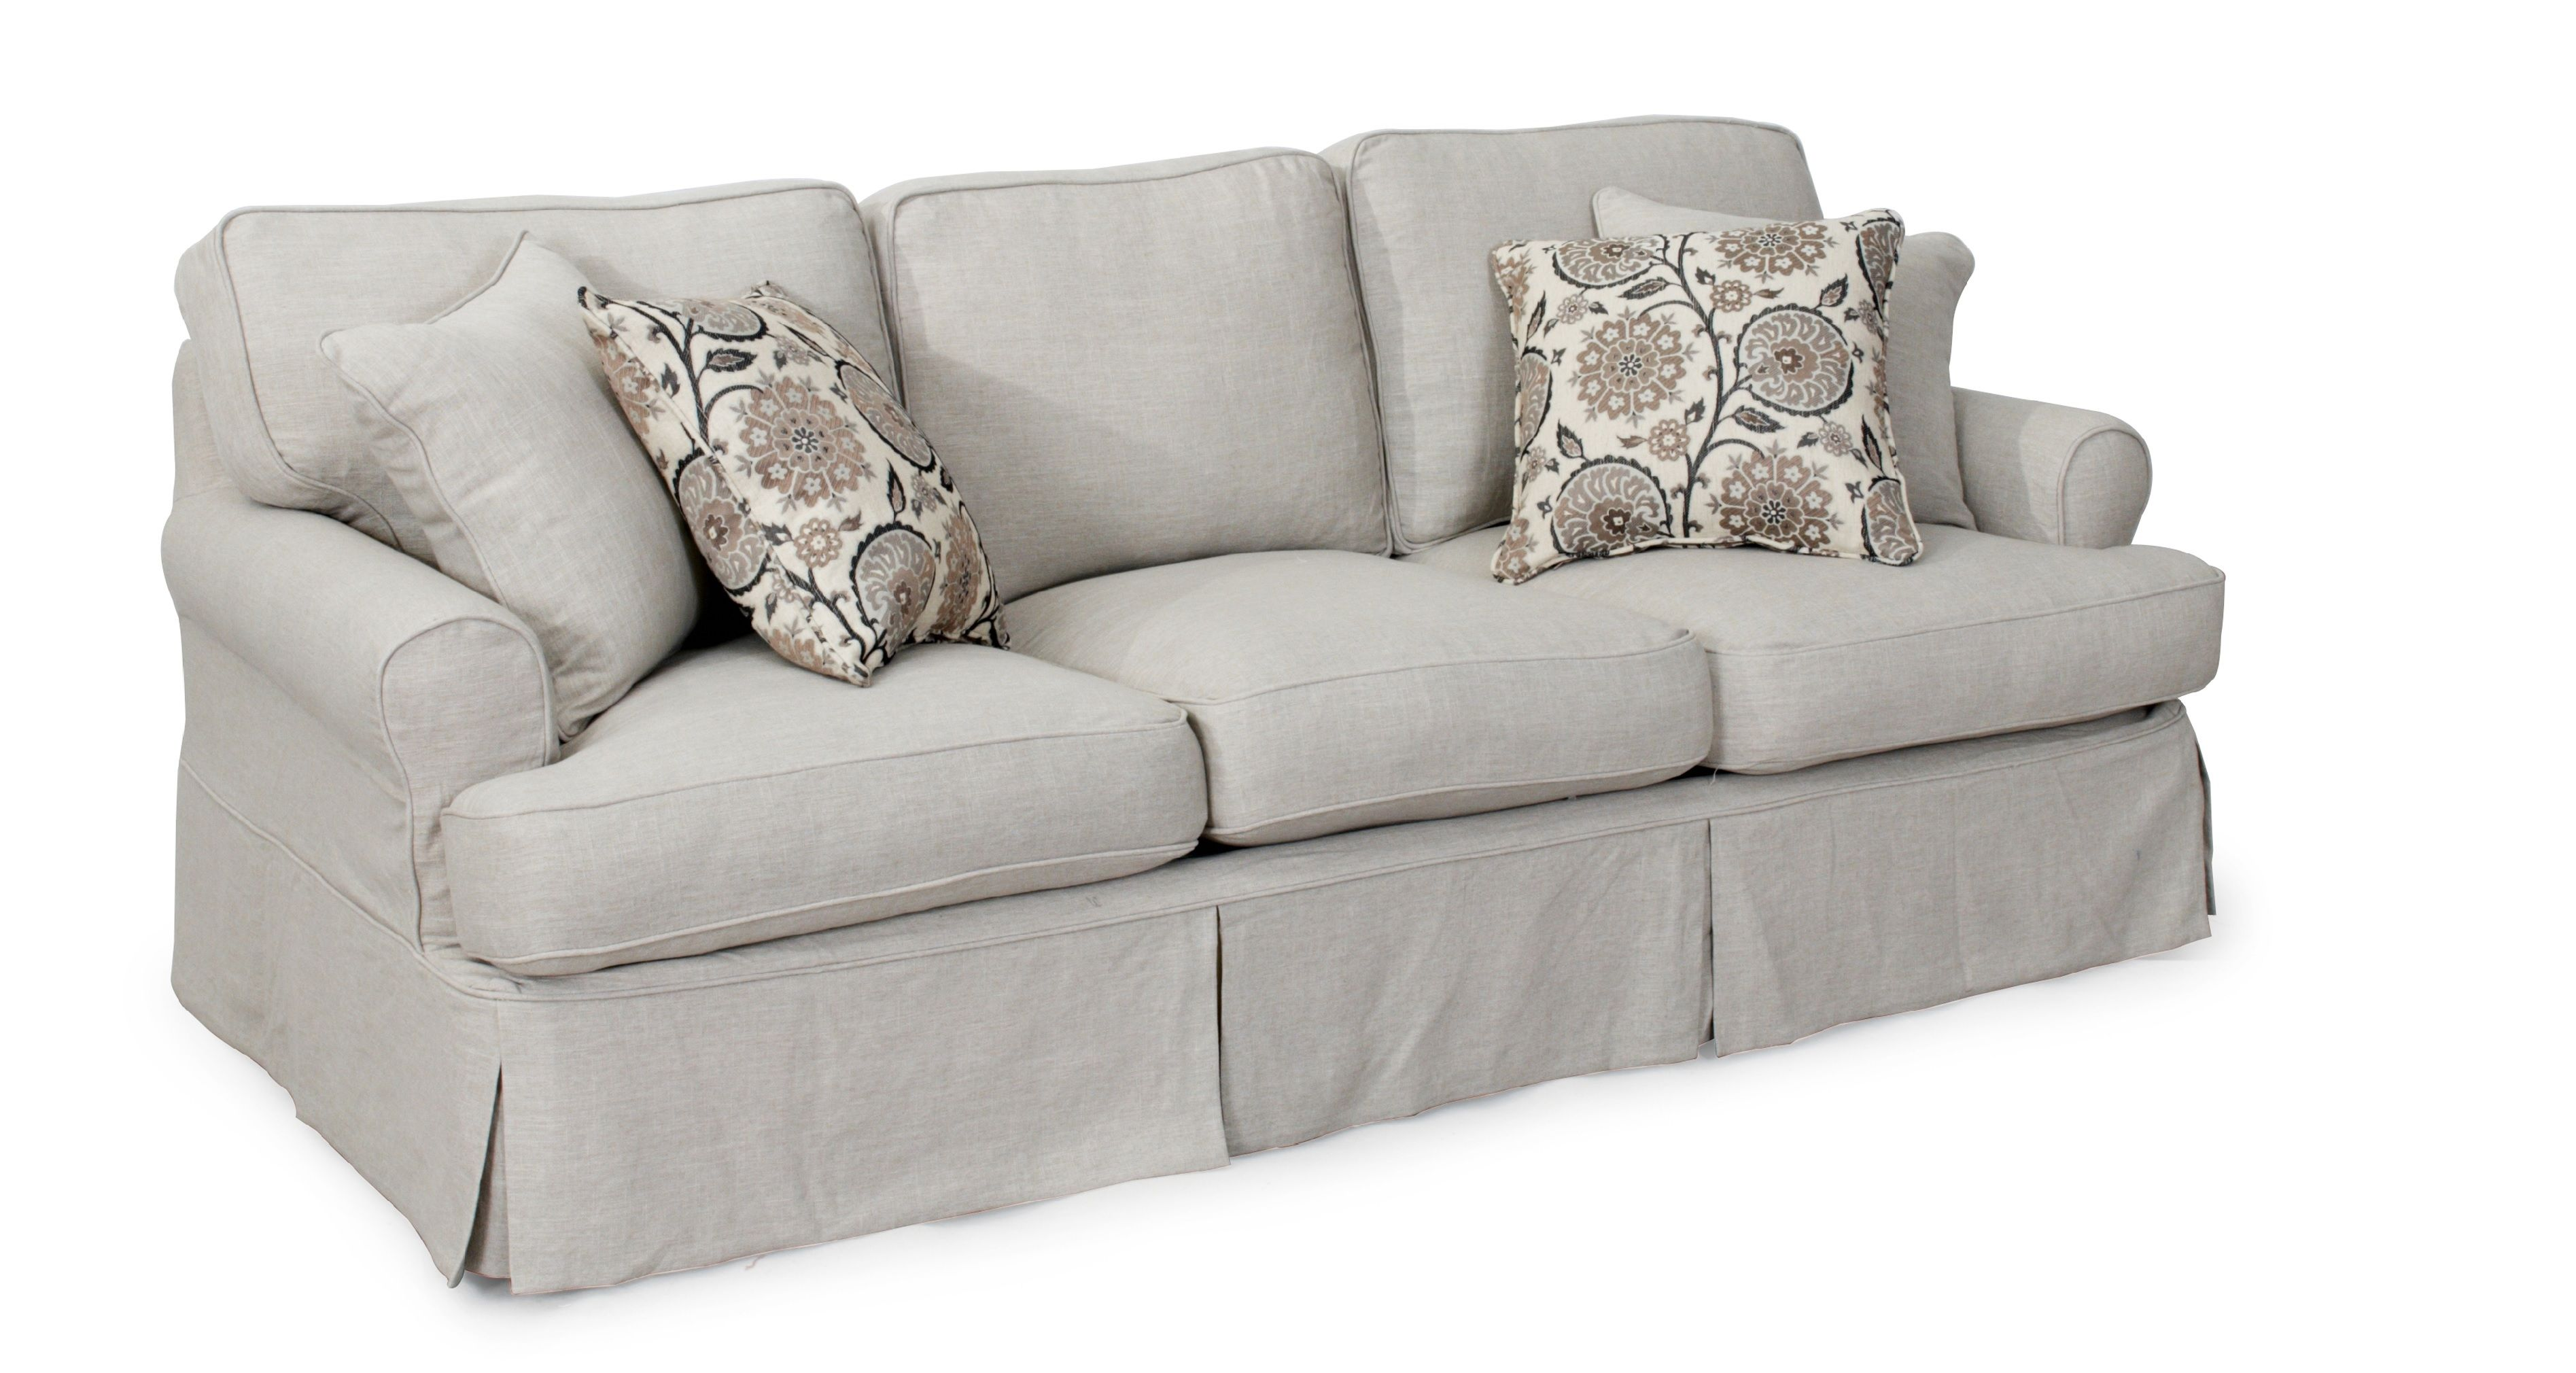 Light Grey Sofa Cover Cushions On Sofa Slipcovered Sofa Slipcovers